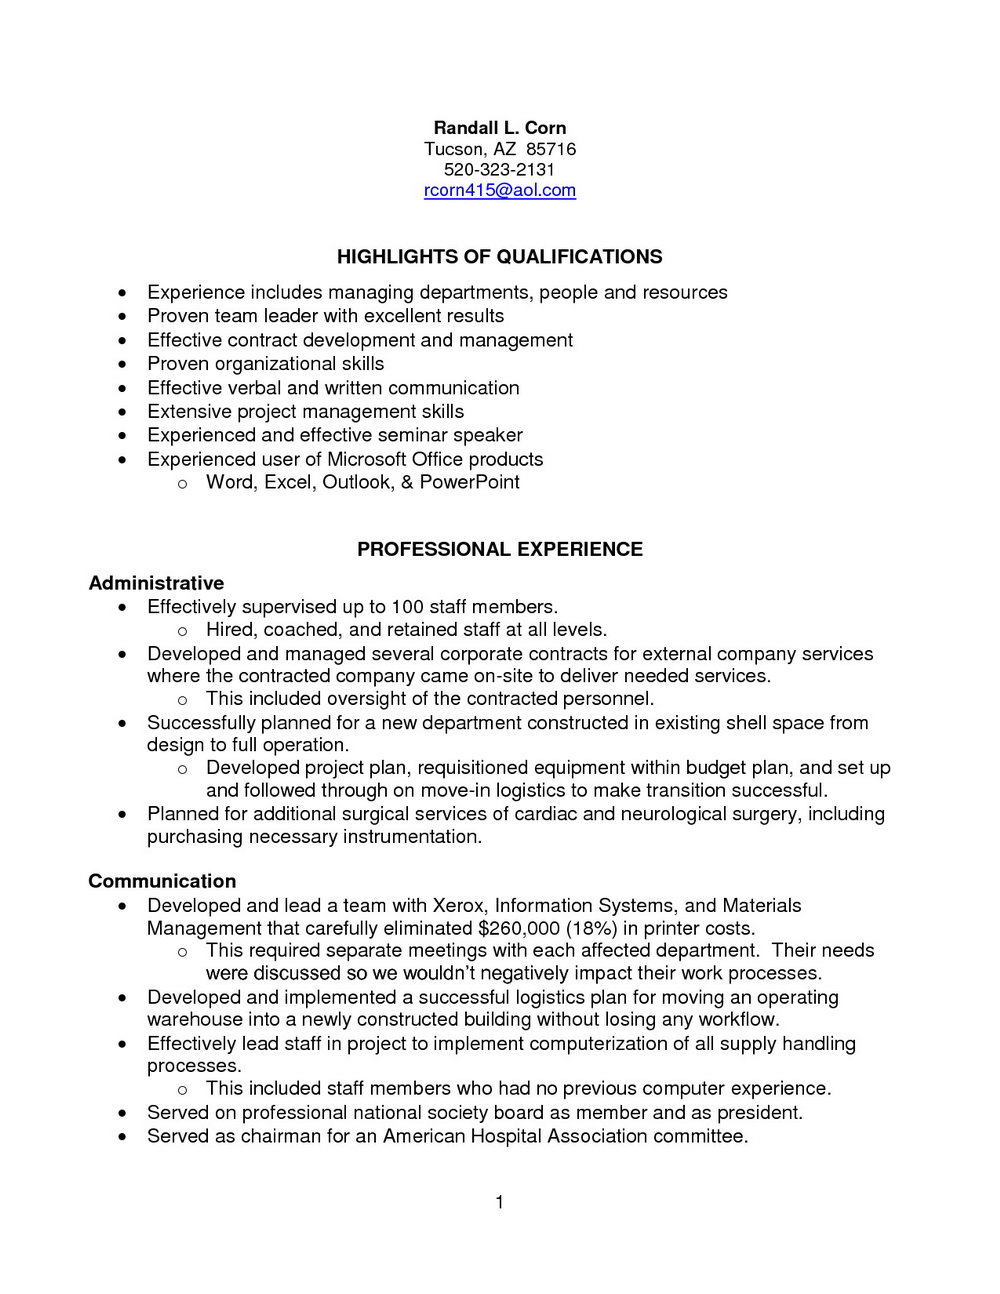 Sample Resume For Sterile Processing Technician